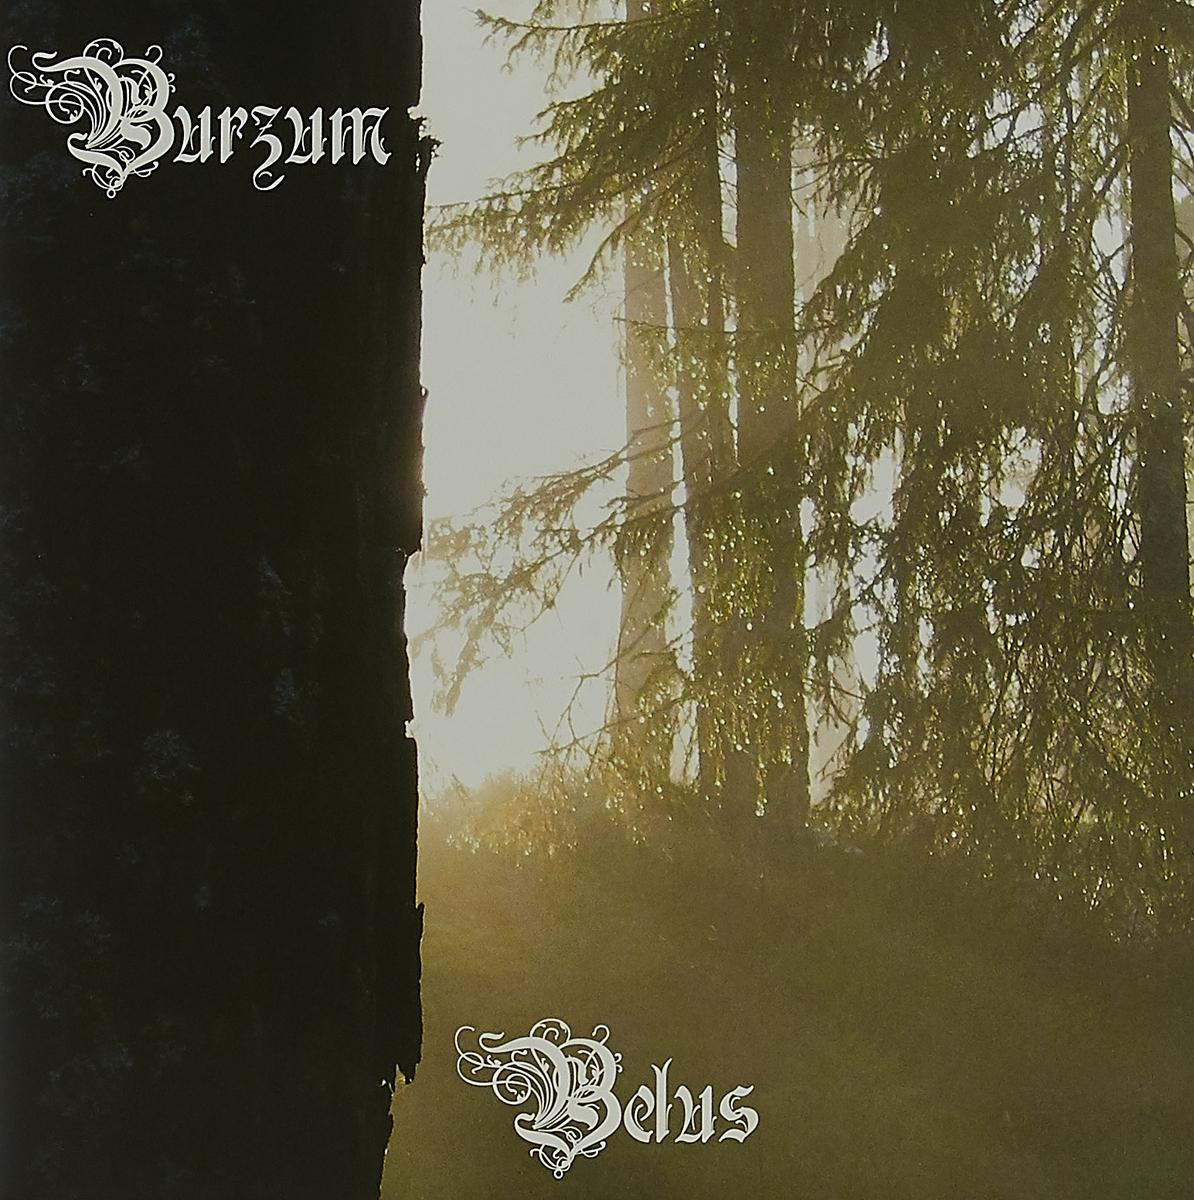 Фото - Burzum Burzum. Belus (2 LP) burzum burzum anthology 2 lp